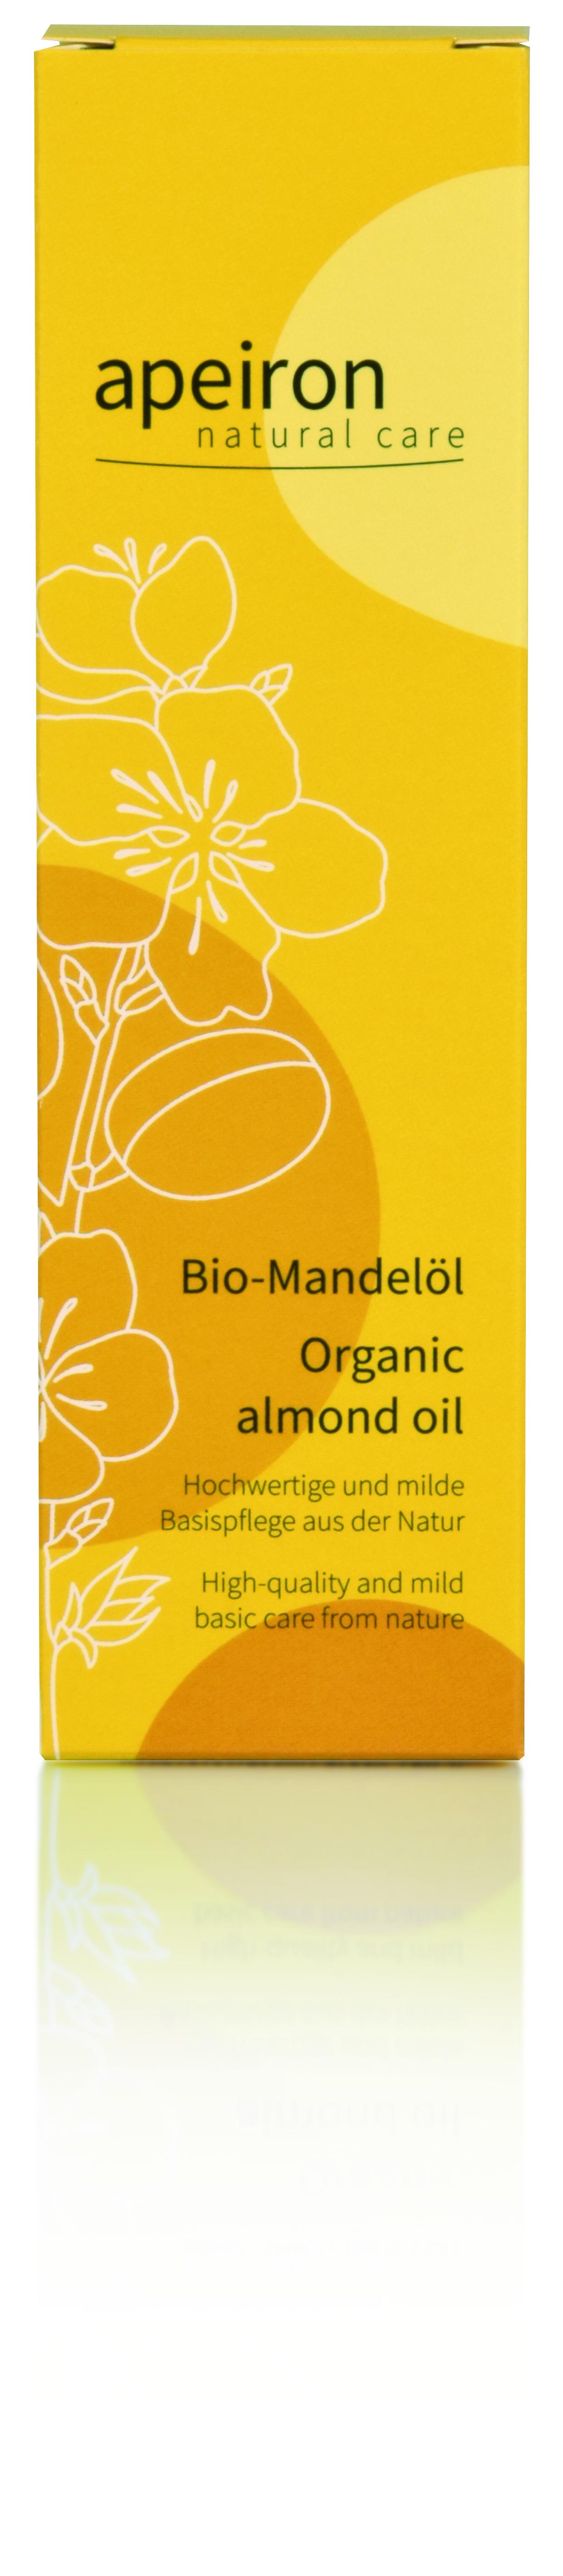 Bio-Mandelöl